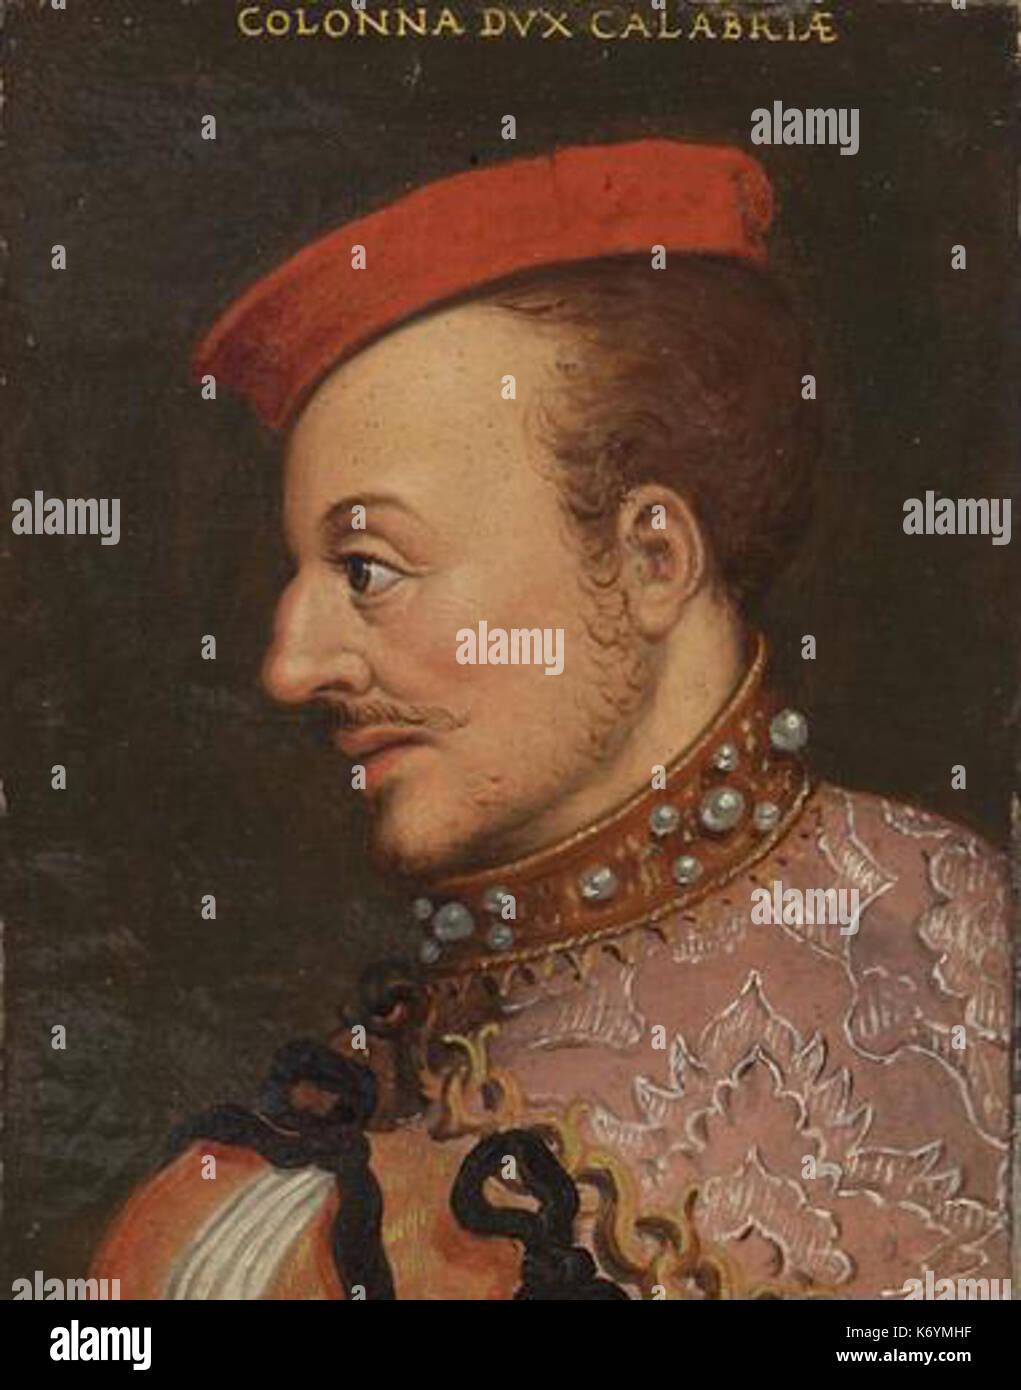 Prince Ferdinand Pius, Duke of Calabria